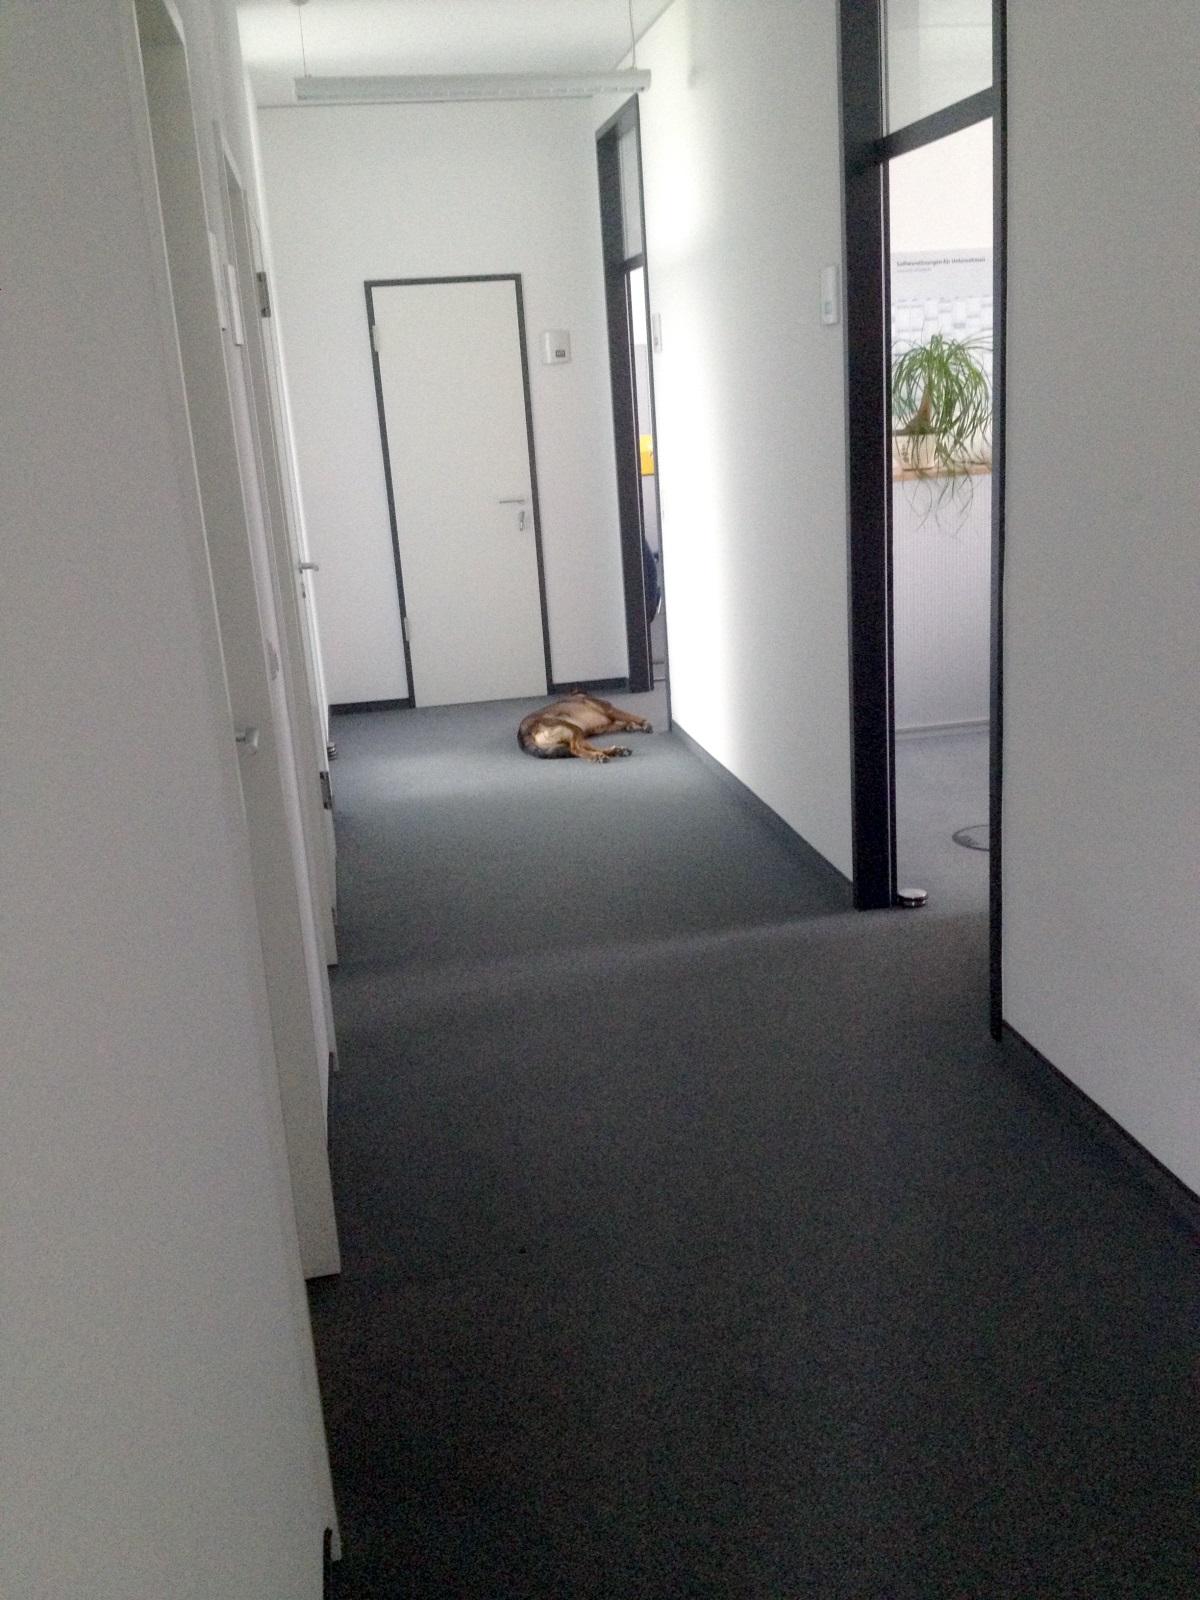 hund-im-buero-01